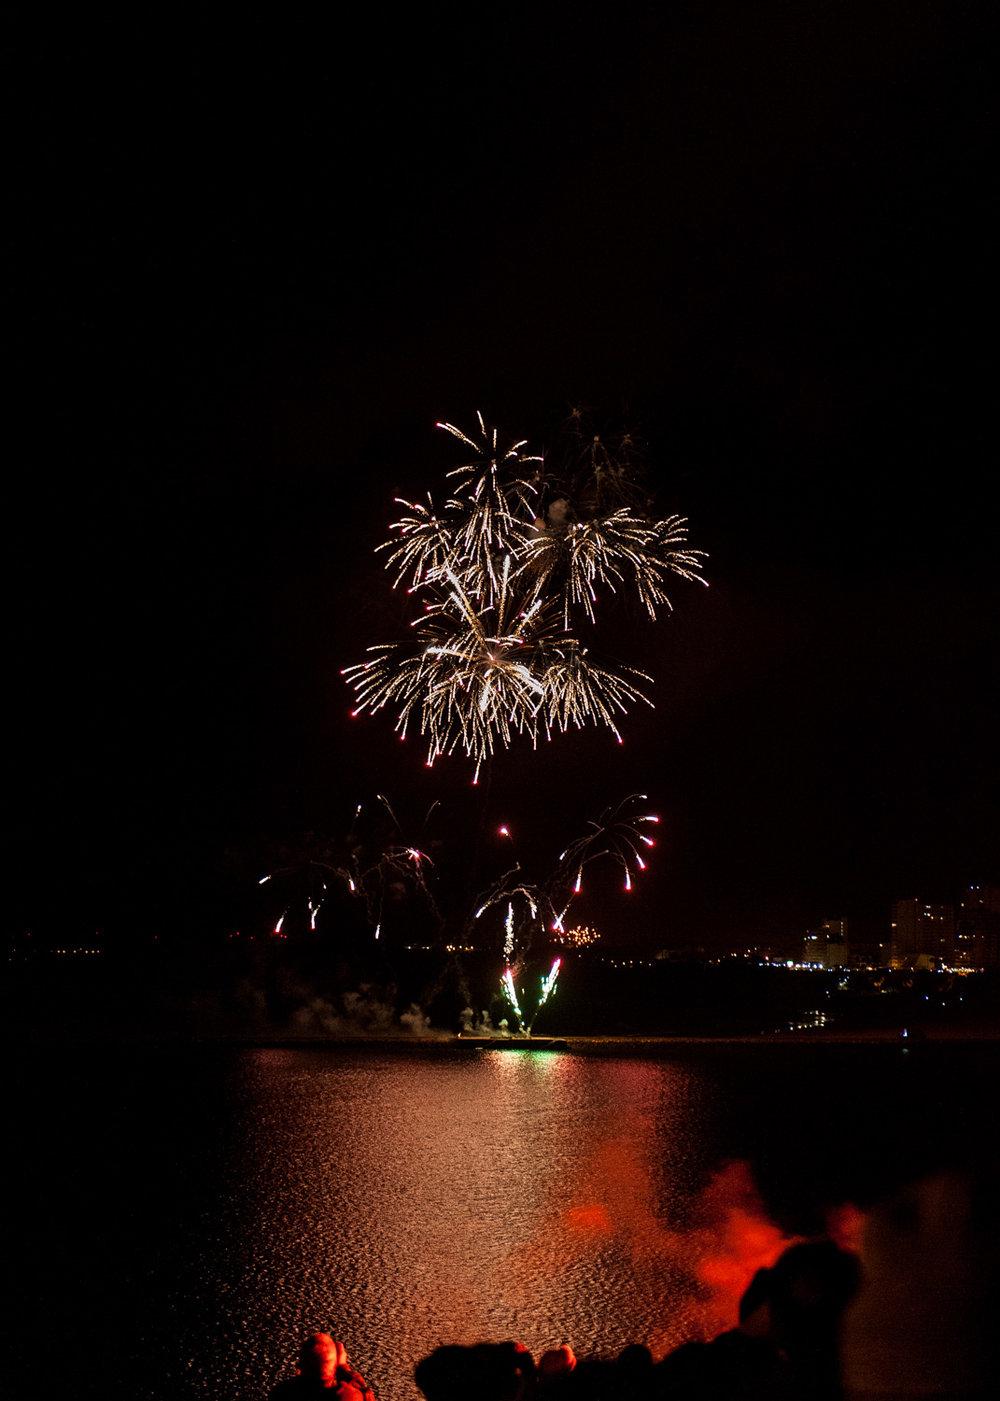 fogo-de-artificio 5.jpg